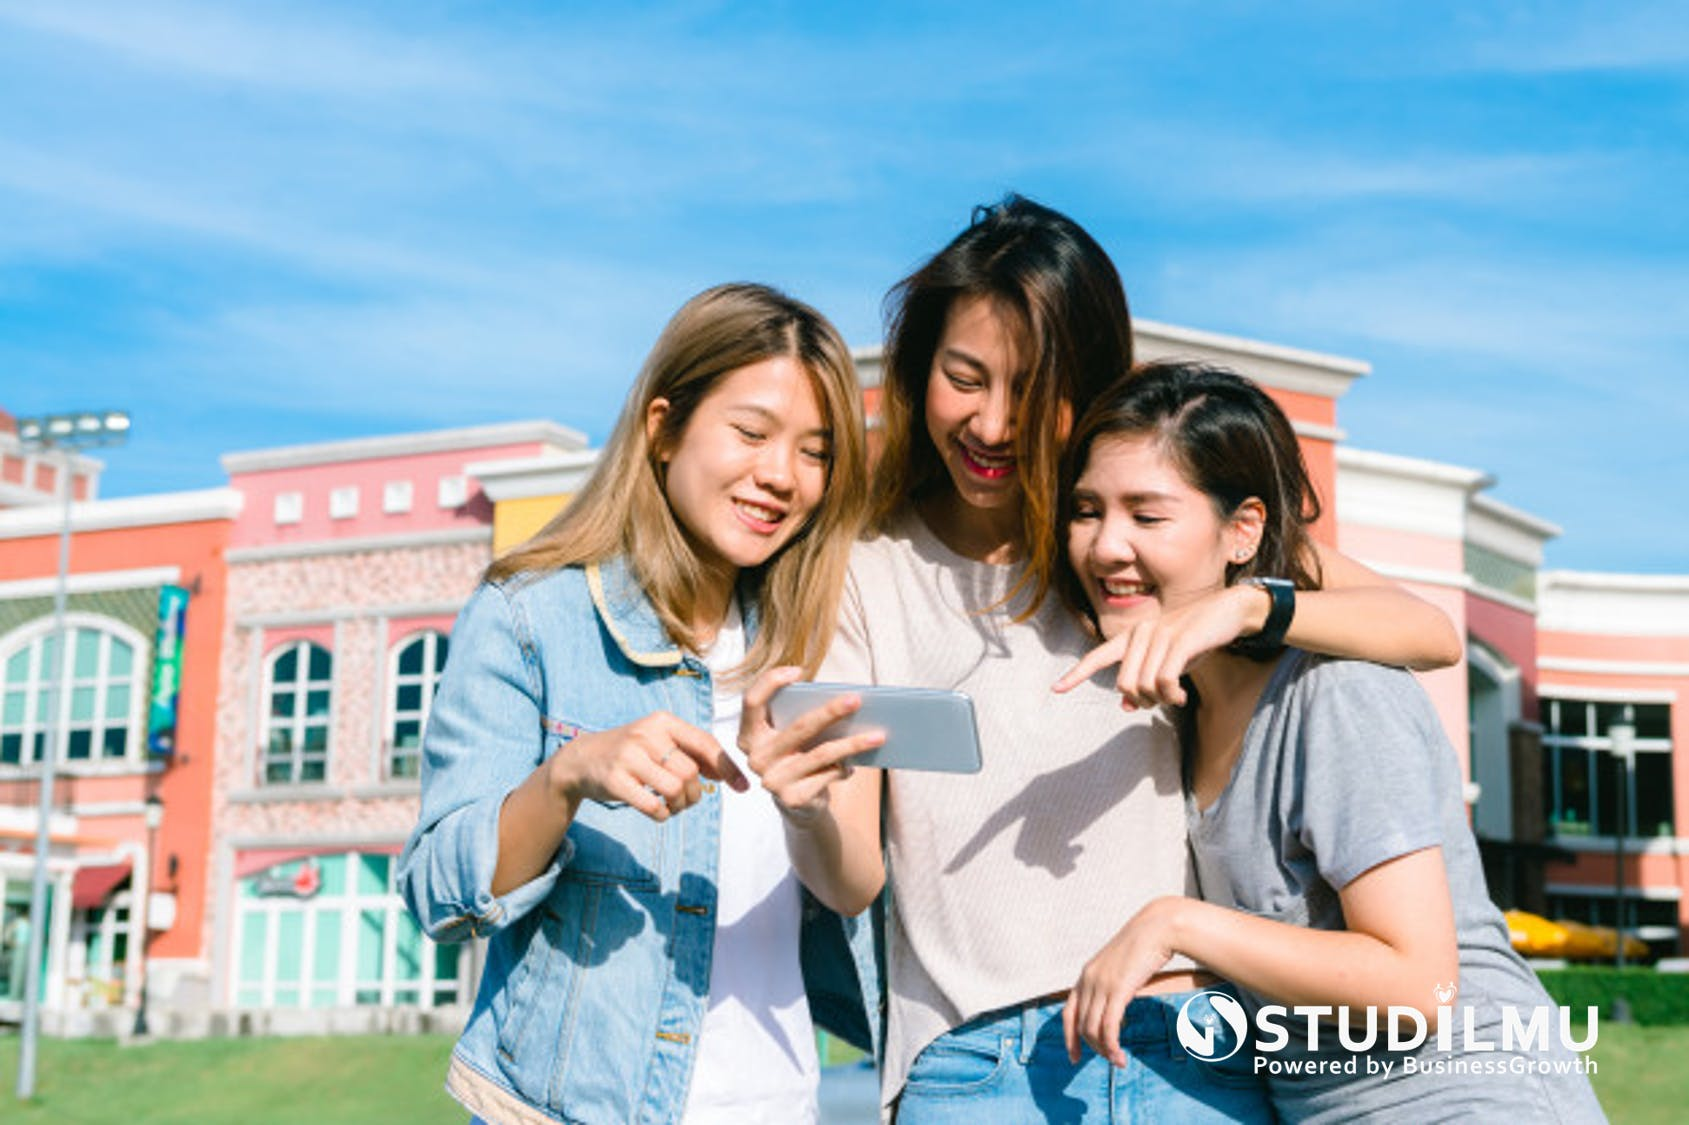 STUDILMU Career Advice - Cara Mengendalikan Diri